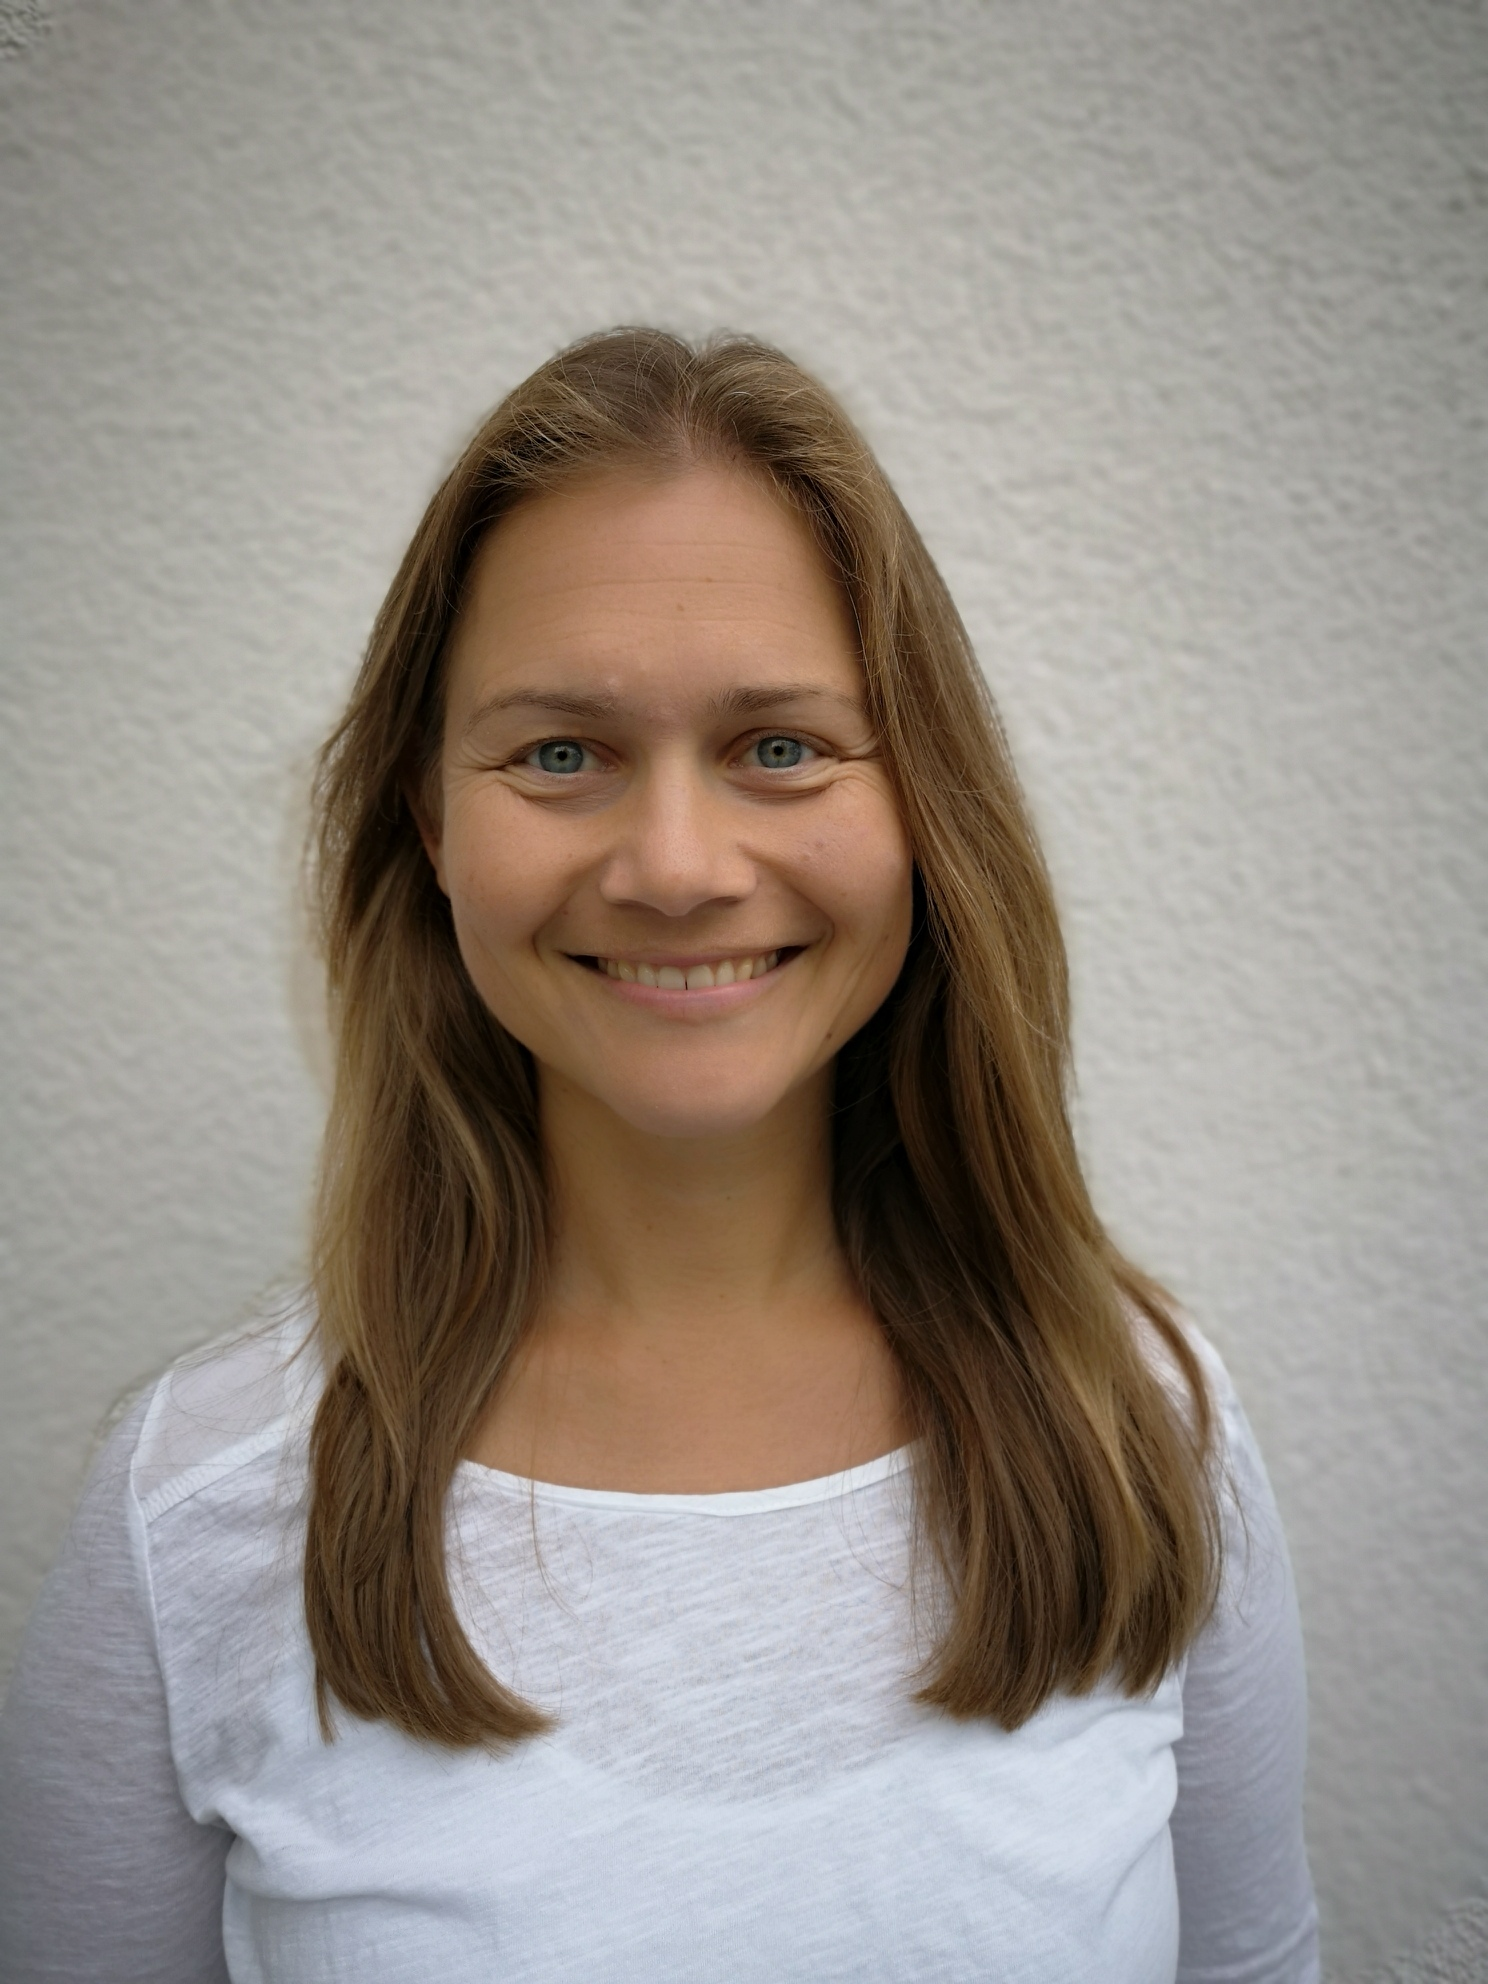 Andrea Schauer